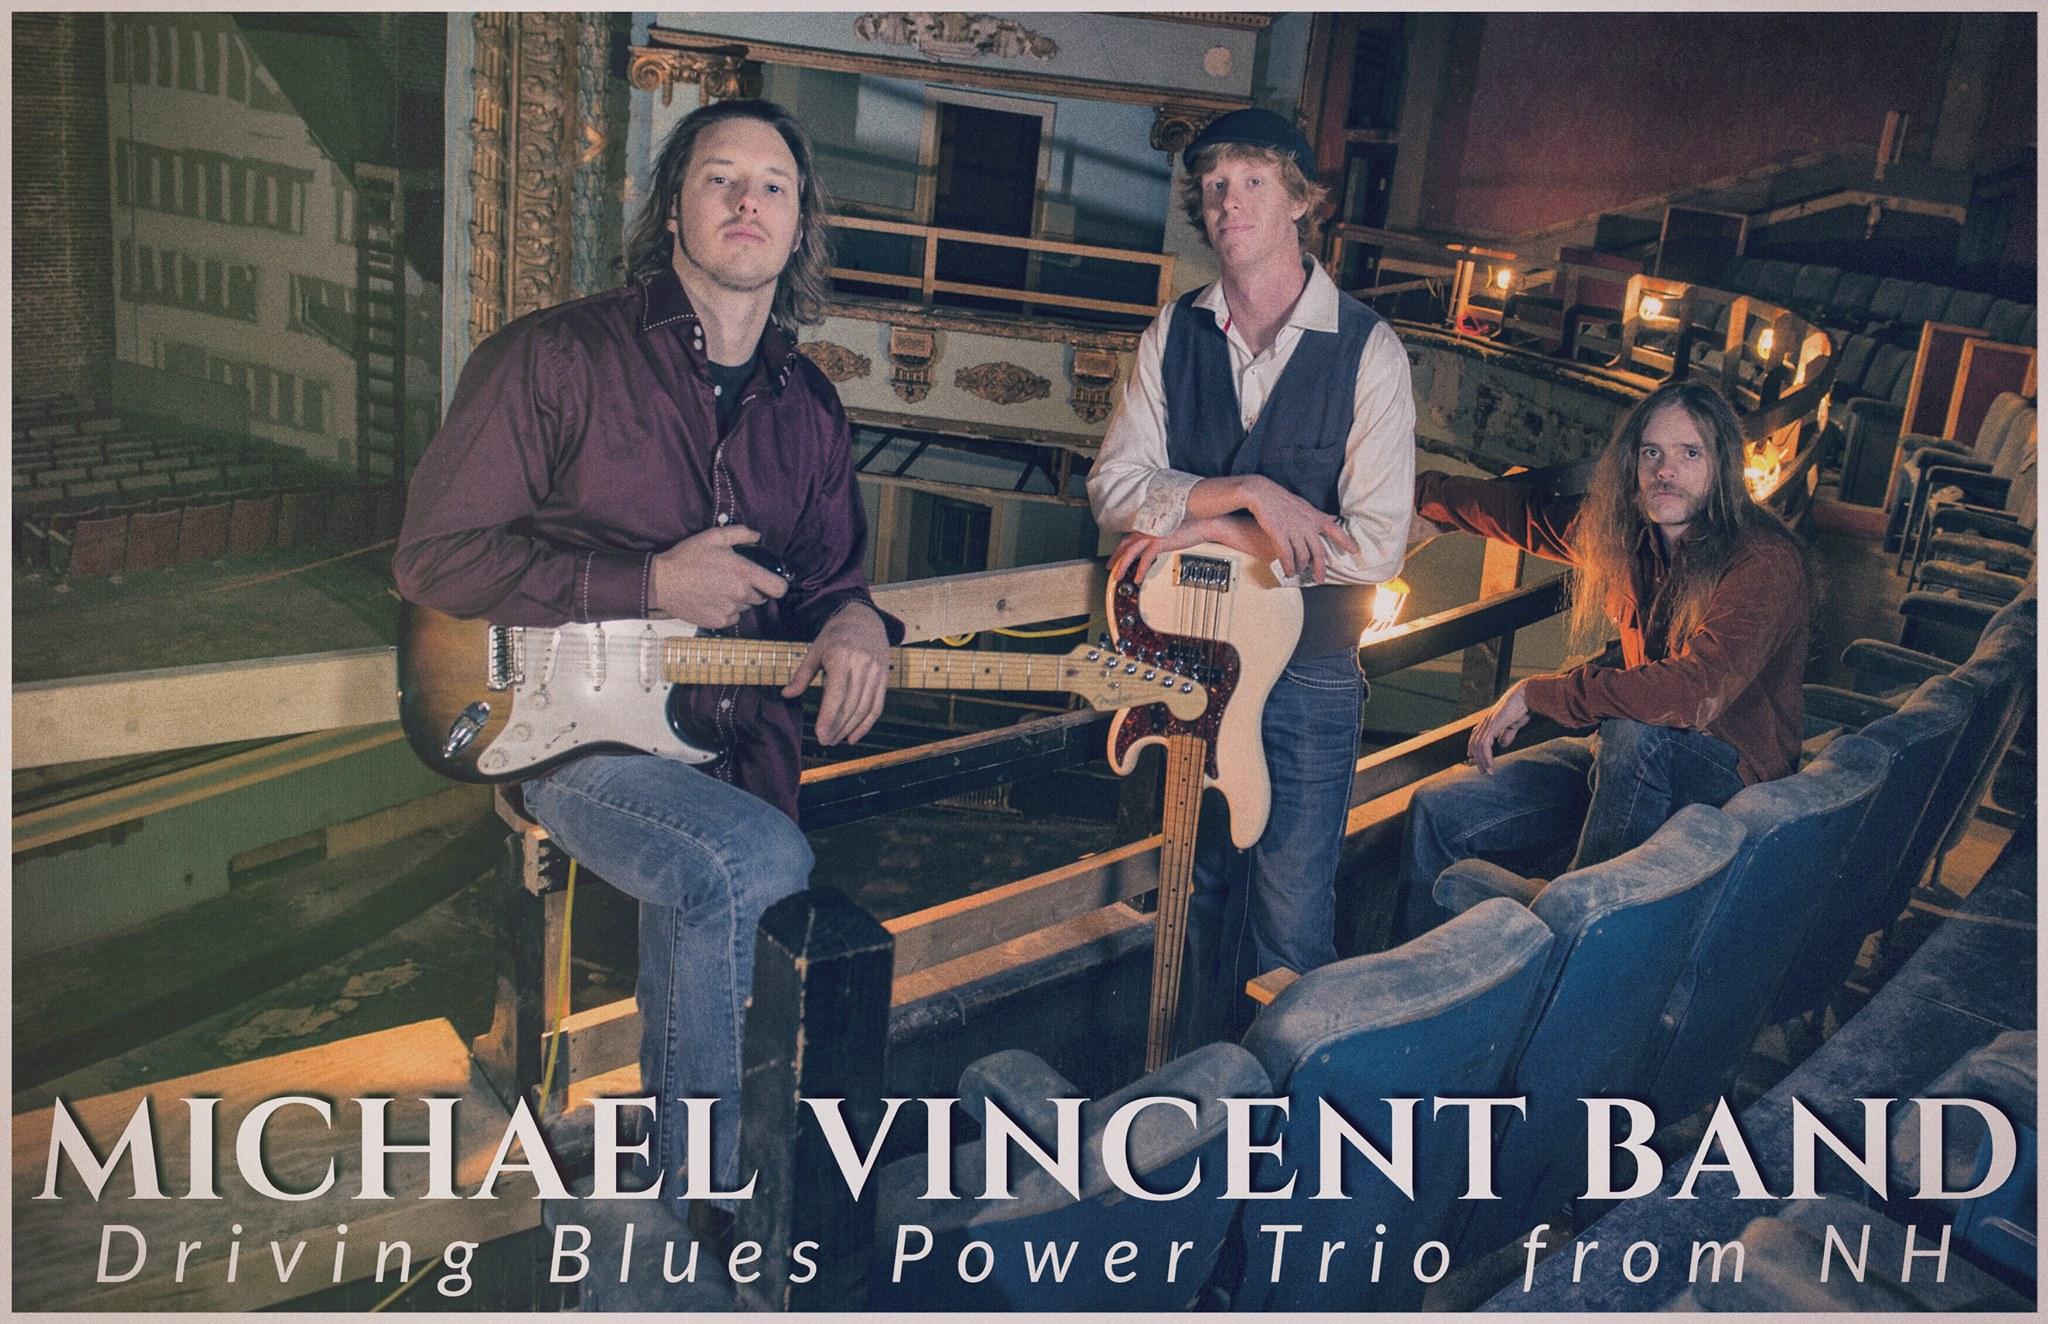 Michael Vincent Band, Delta Blues Singers, Gulf Coast Blues Bands, East Coast Blues Artists, Gulf Coast Blues Artists